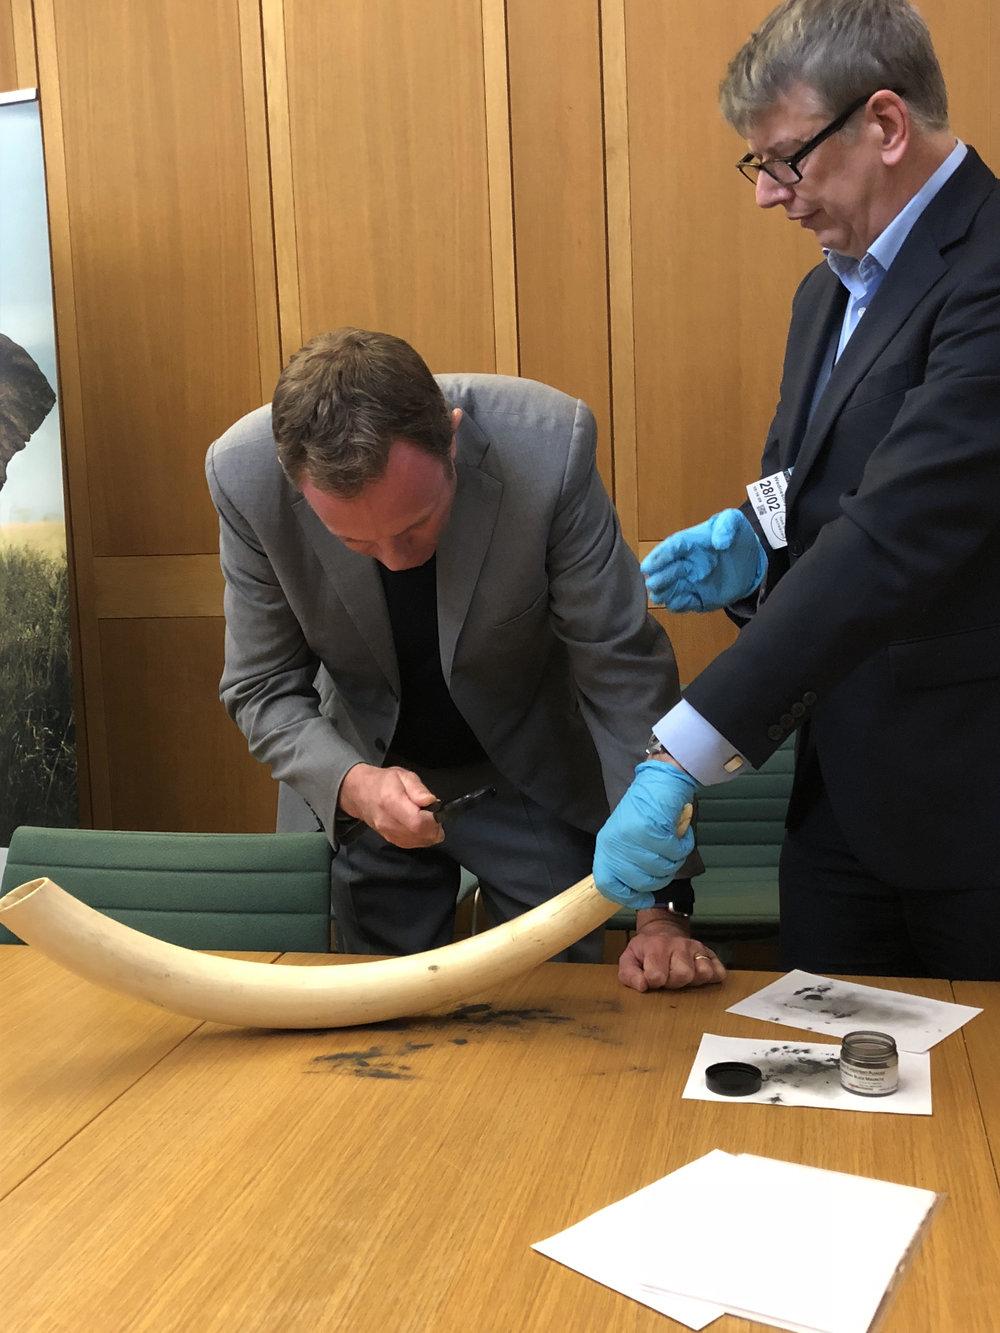 Nick Herbert inspecting innovative new methods of detecting fingerprints on elephant tusks at an International Fund of Animal Welfare (IFAW) event